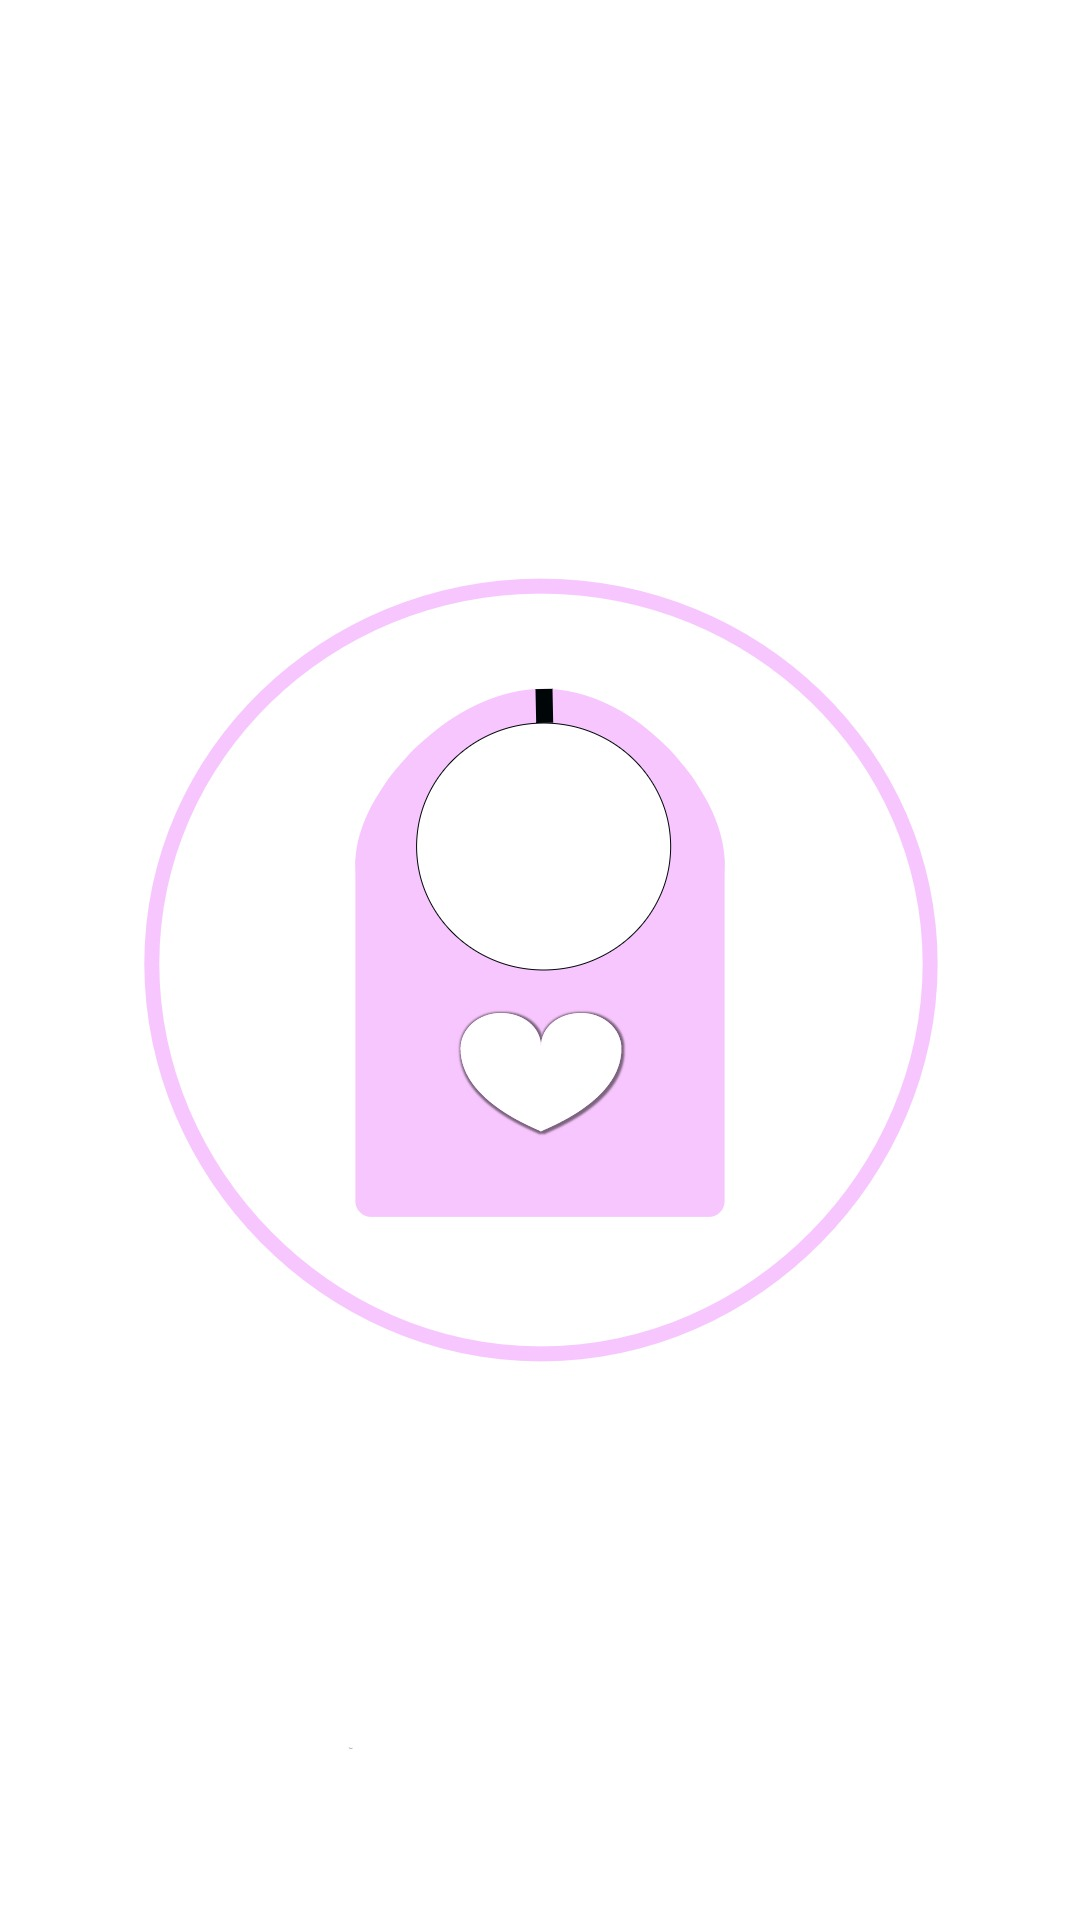 Instagram-cover-baby-girl-bib-pink-lotnotes.com.jpg